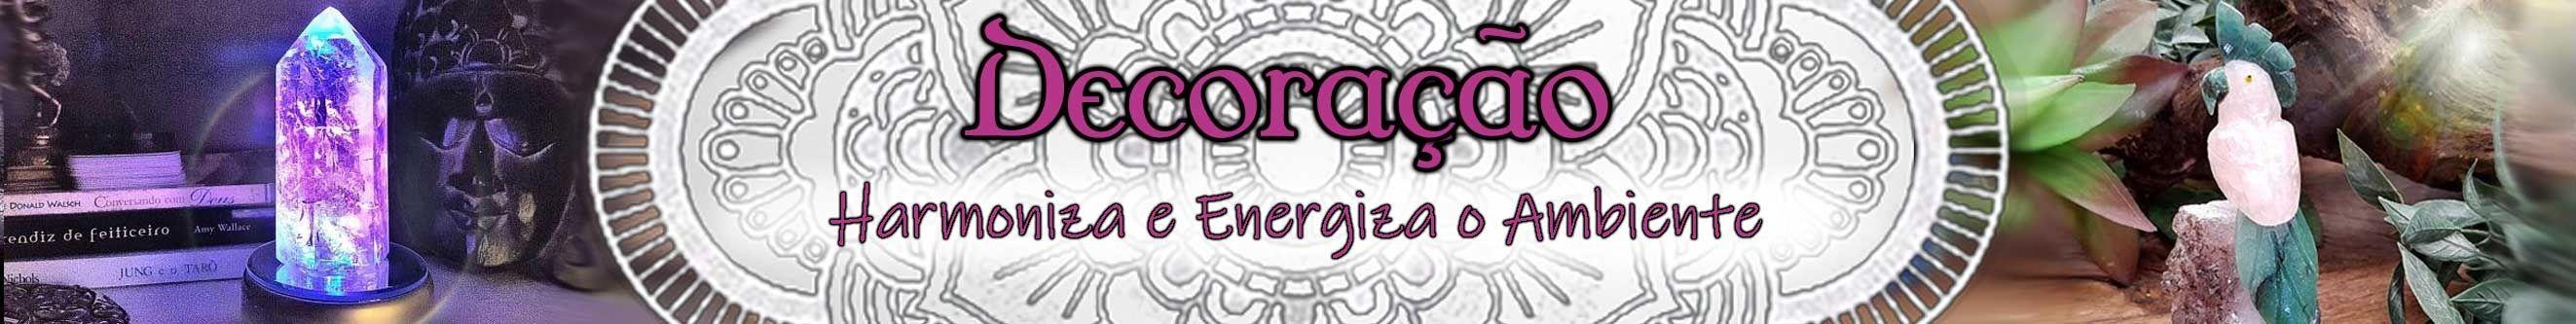 DECORAÇAO PEDRAS